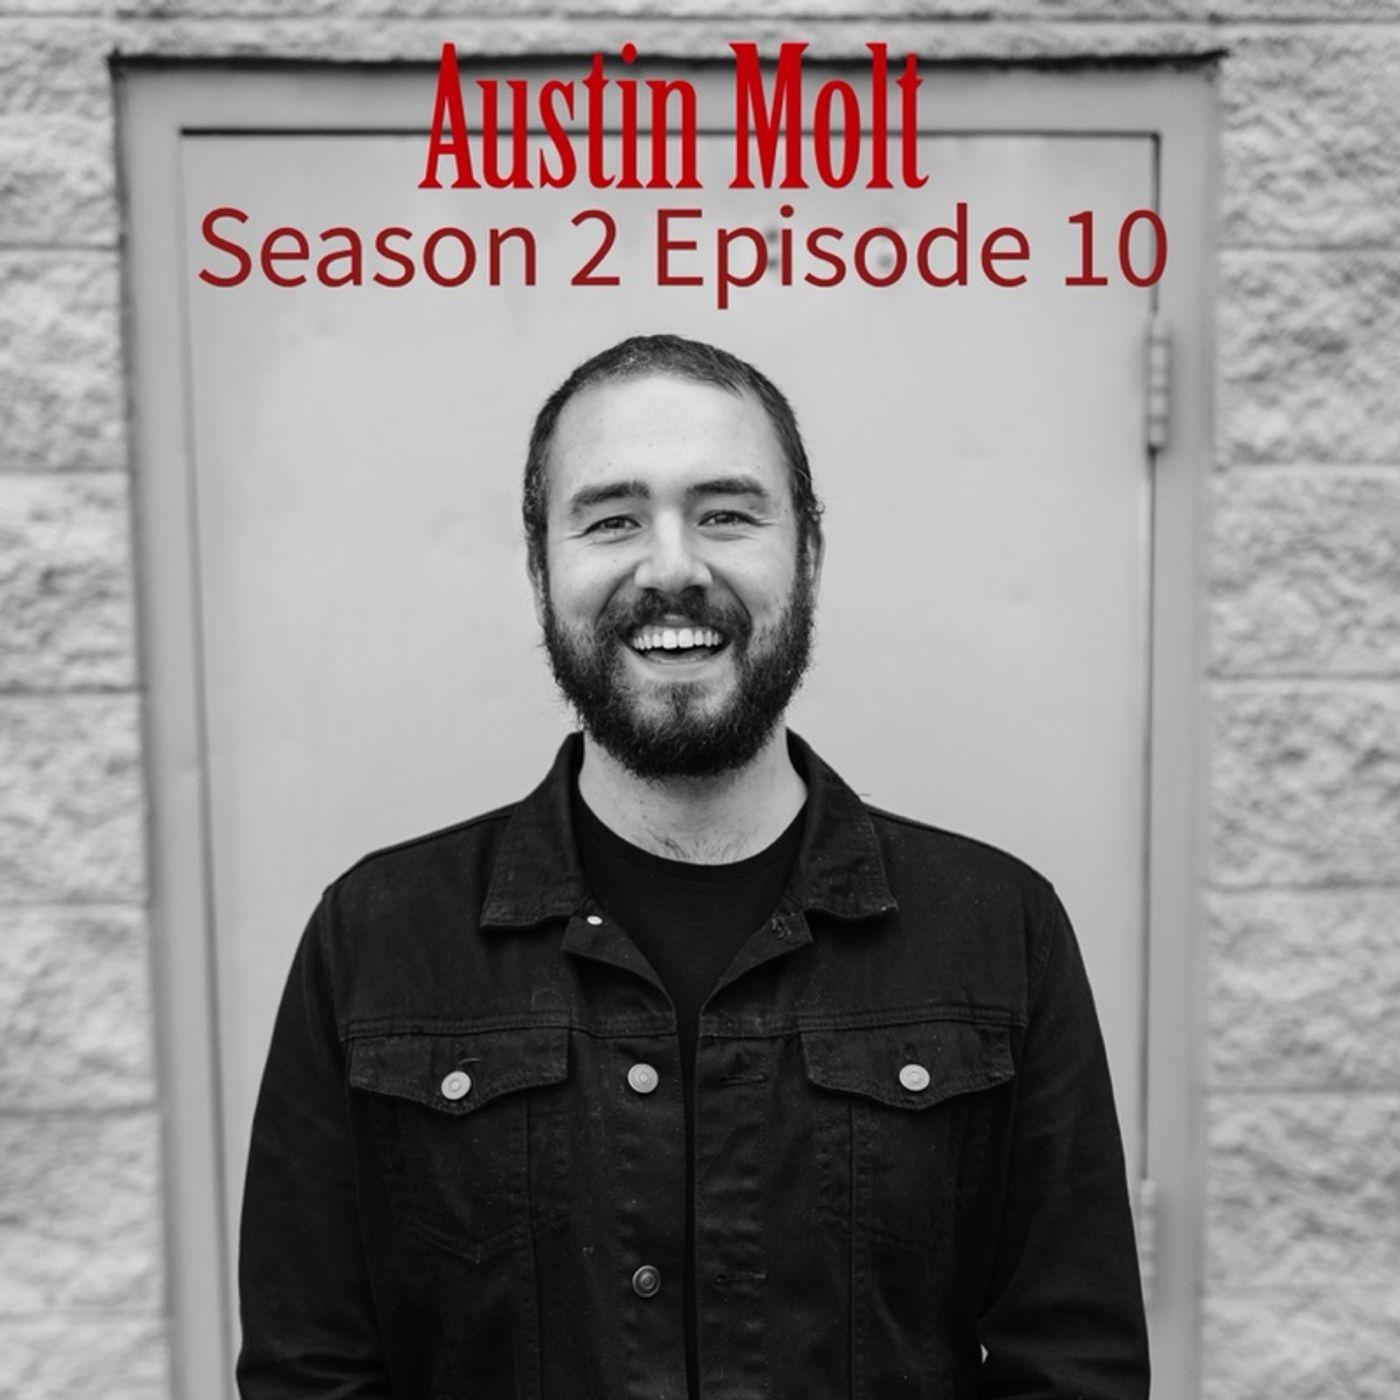 Season 2 Episode 10 - It's All Manure Part 1 with Austin Molt